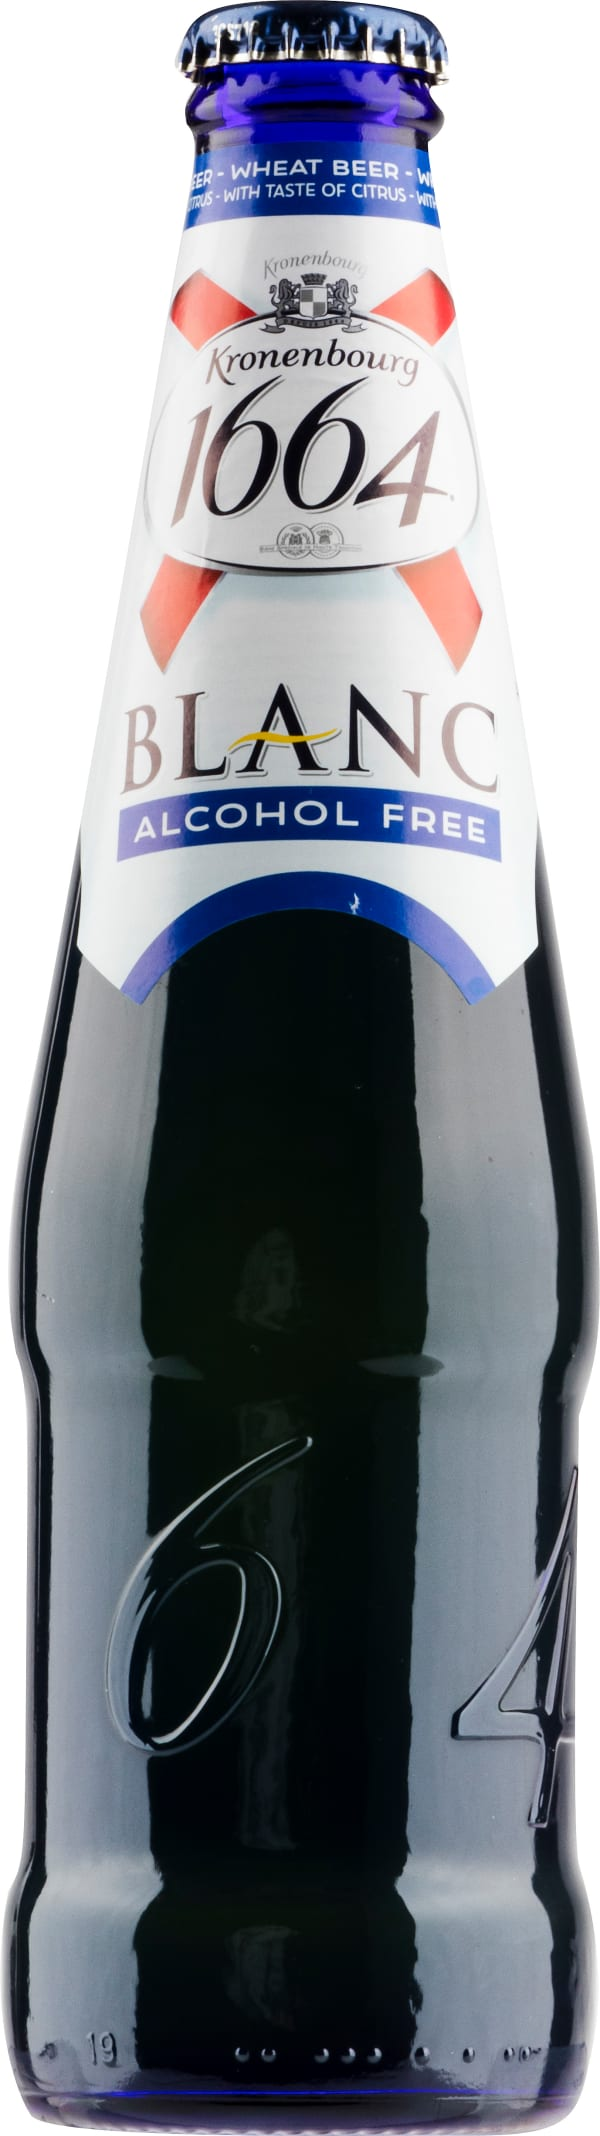 Kronenbourg 1664 Blanc Alcohol Free